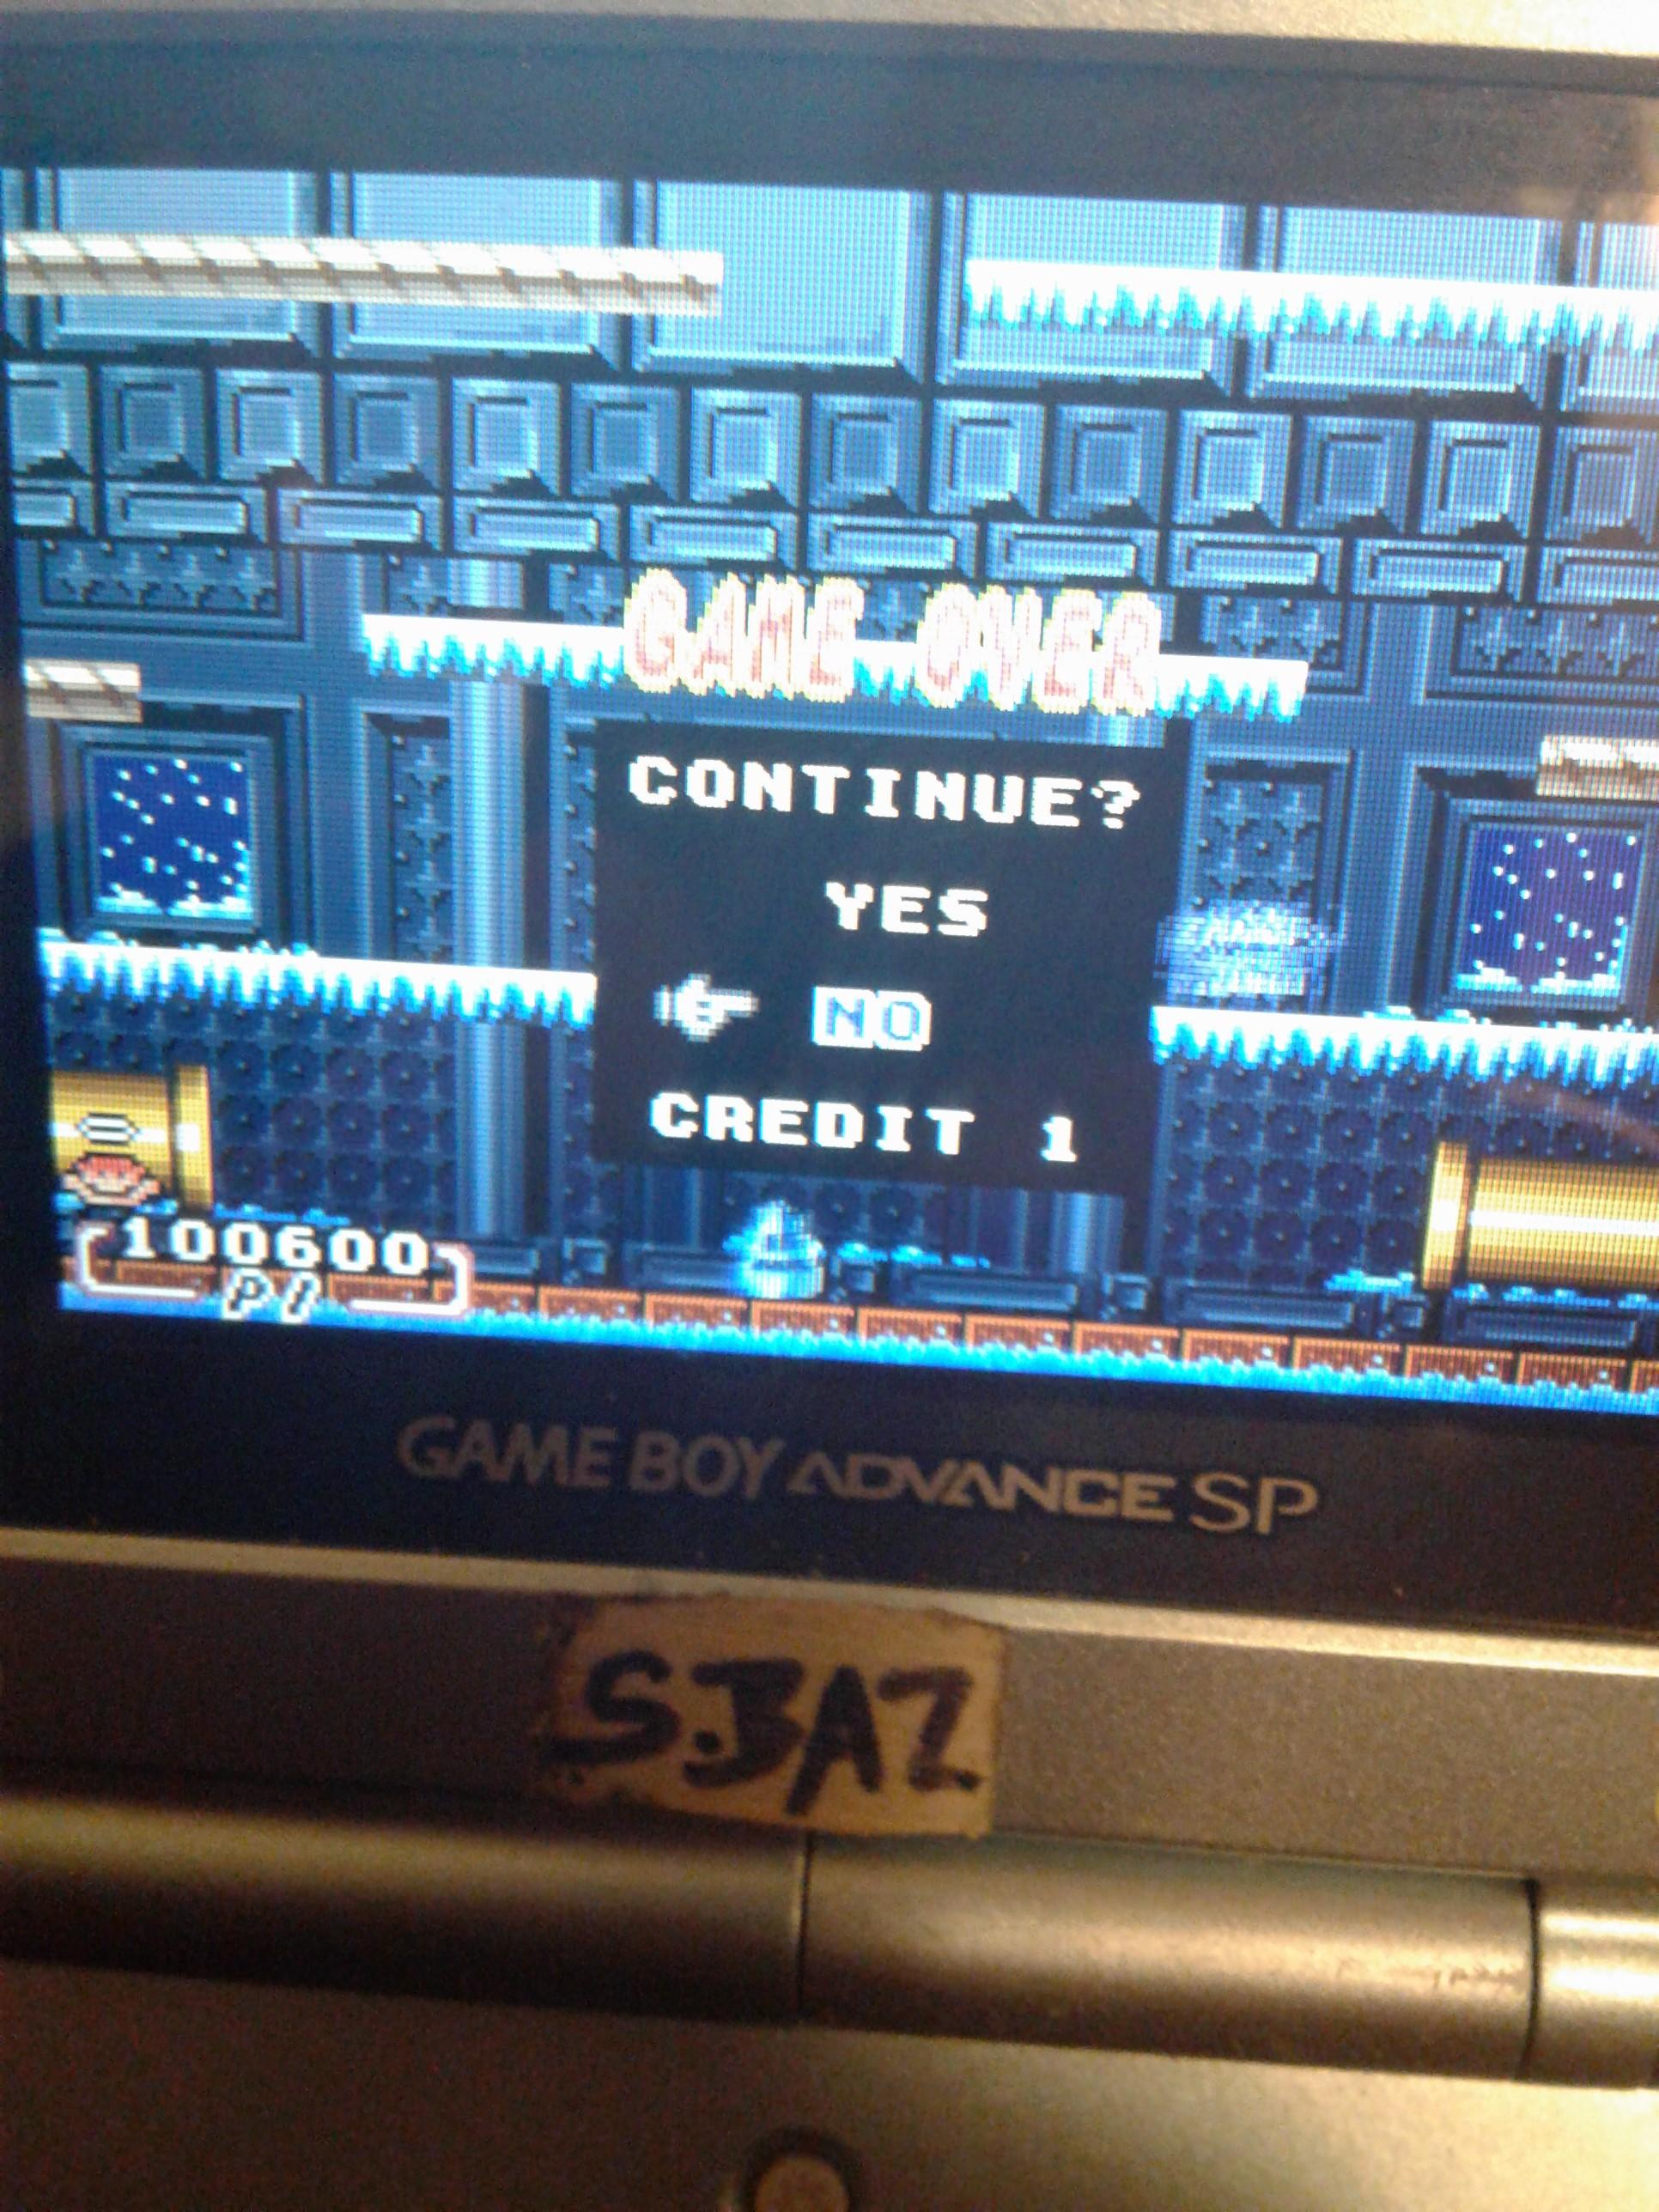 S.BAZ: Super Mario Advance 2: Mario Bros (GBA) 100,600 points on 2019-11-07 10:06:20